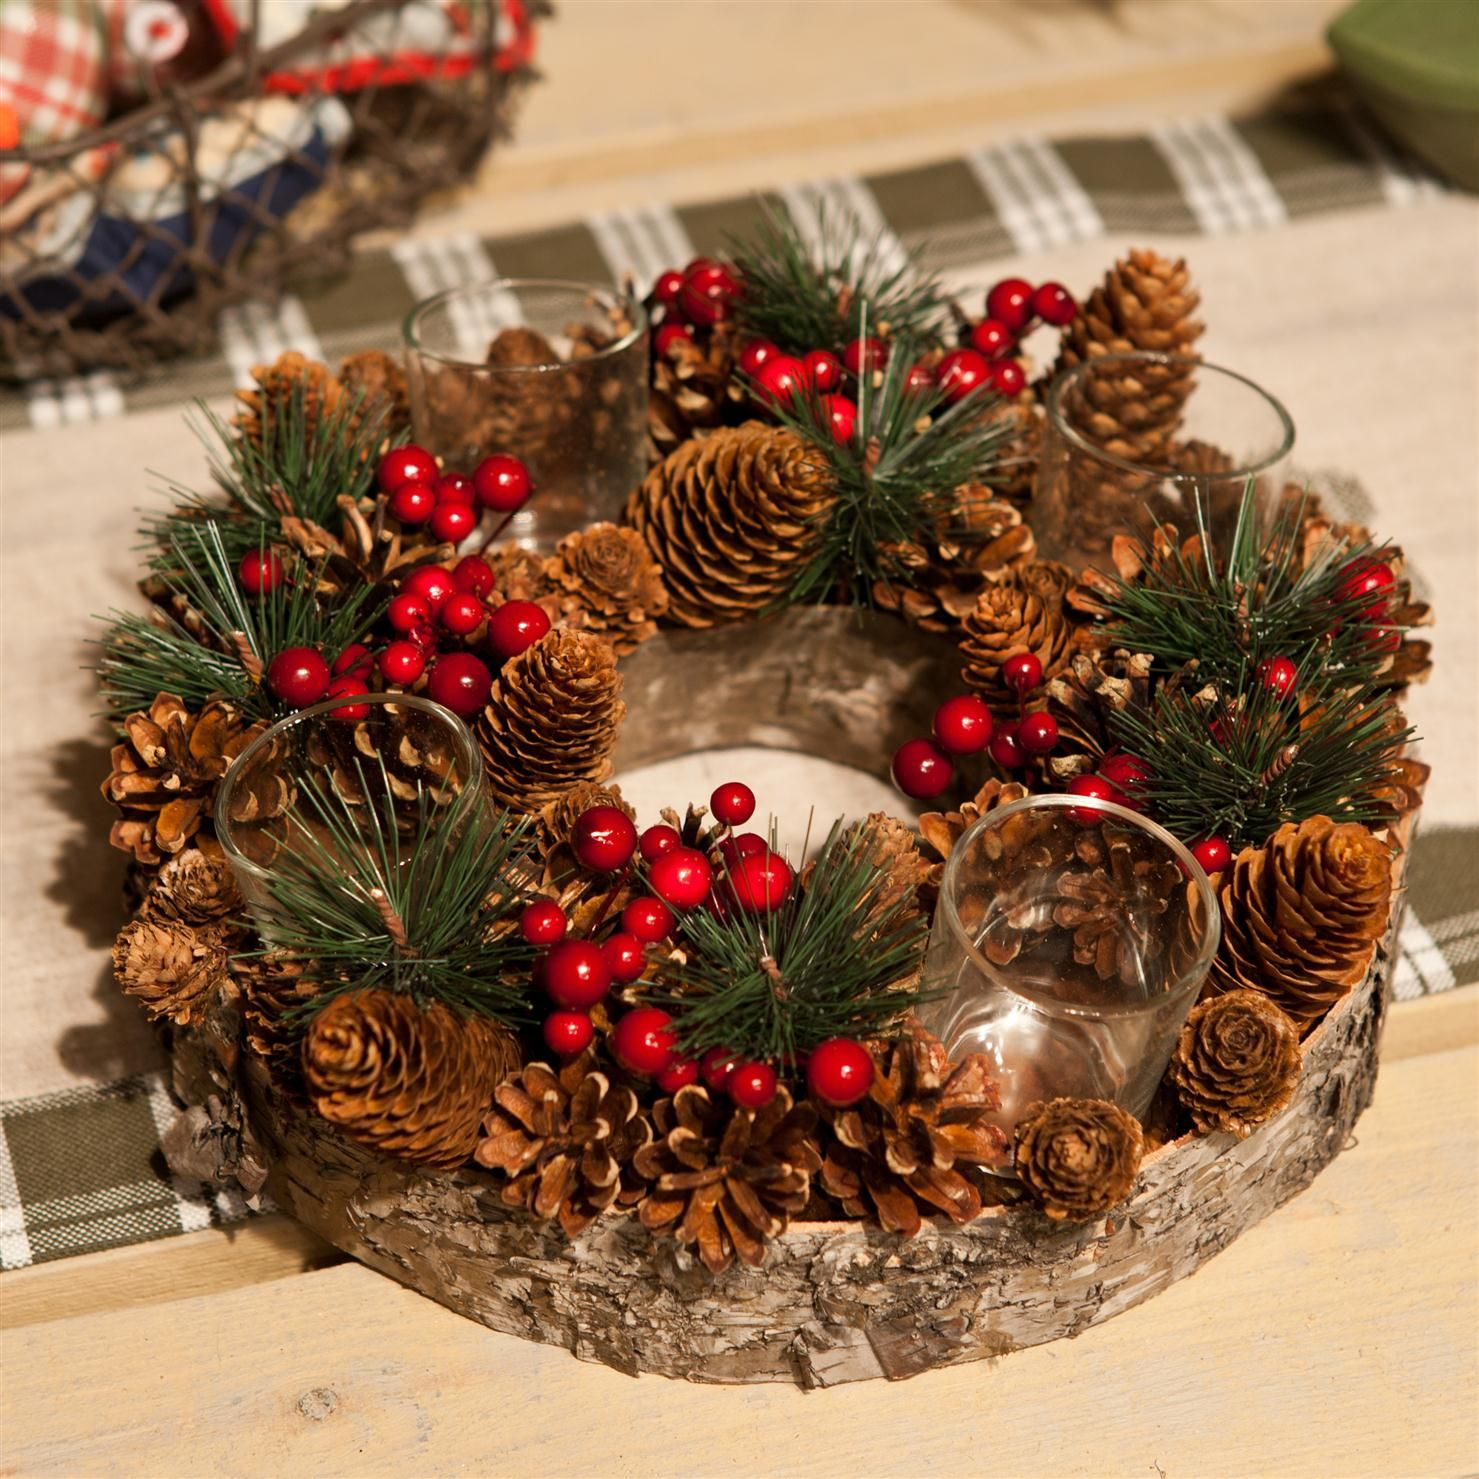 Soporte para velas de gisela graham motivos navide os achica navidad xmas navidad - Soportes para velas ...